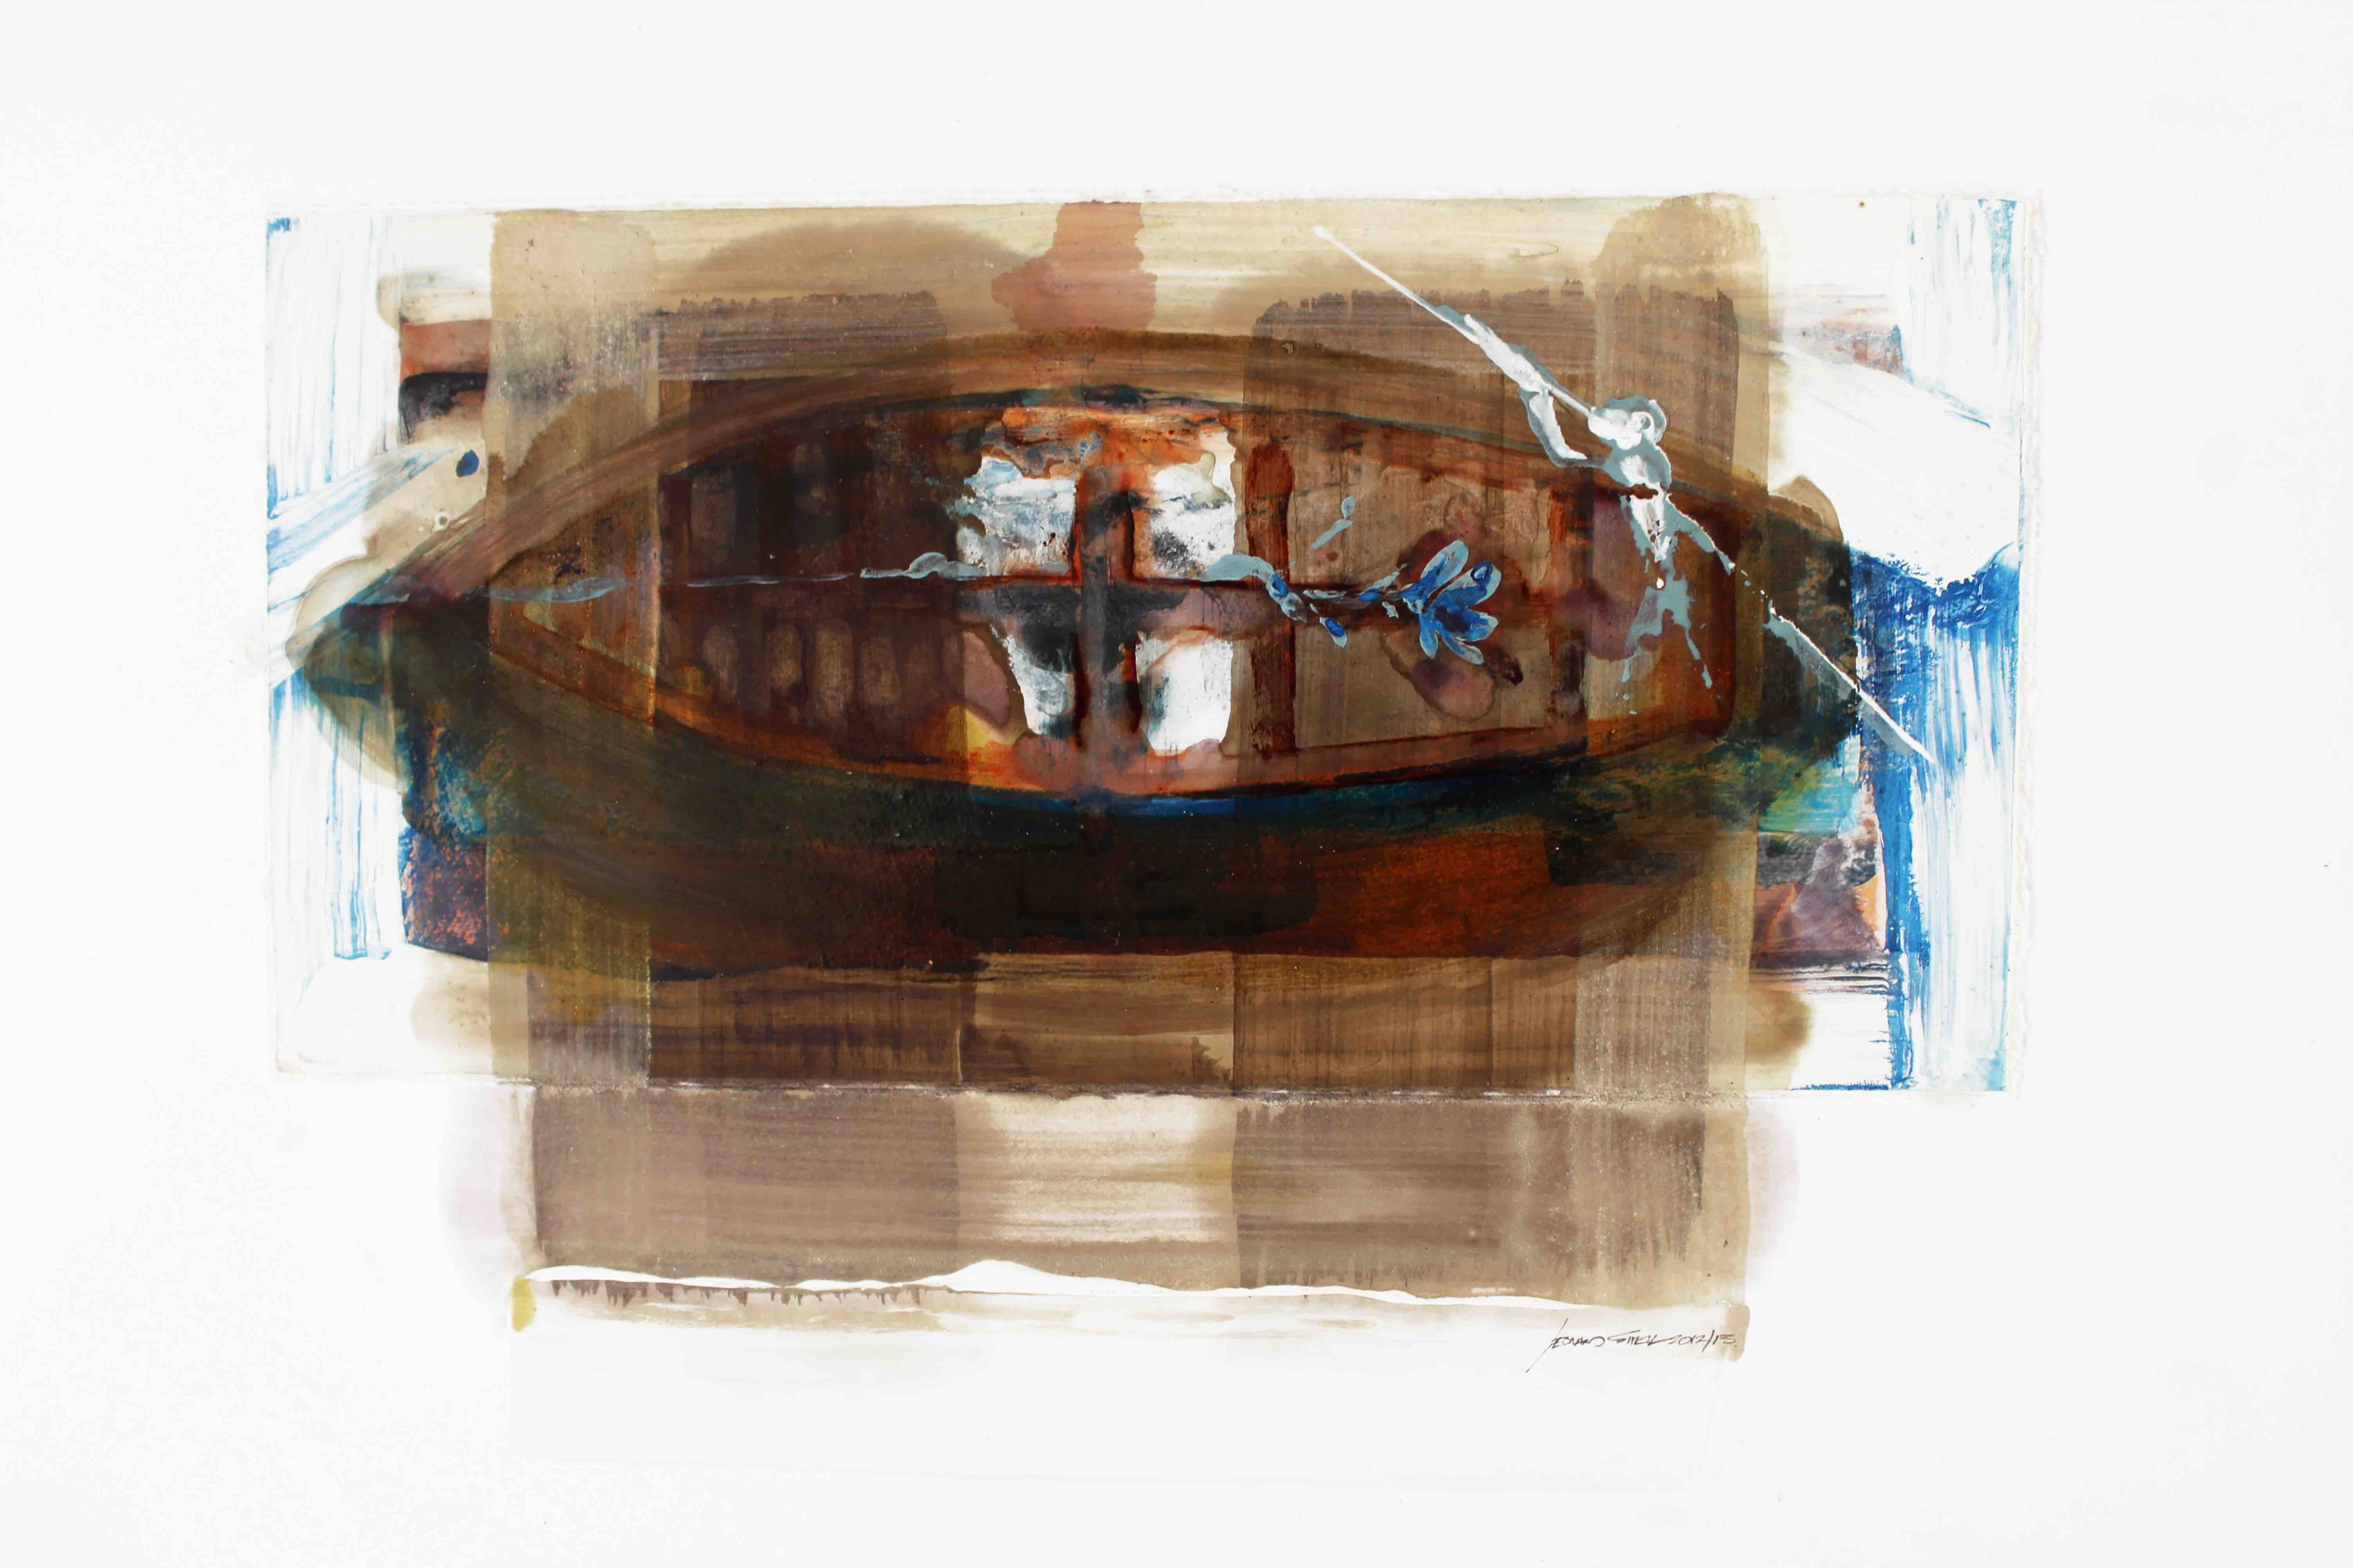 Leonard Sheil: Insel No.5, 2013/14